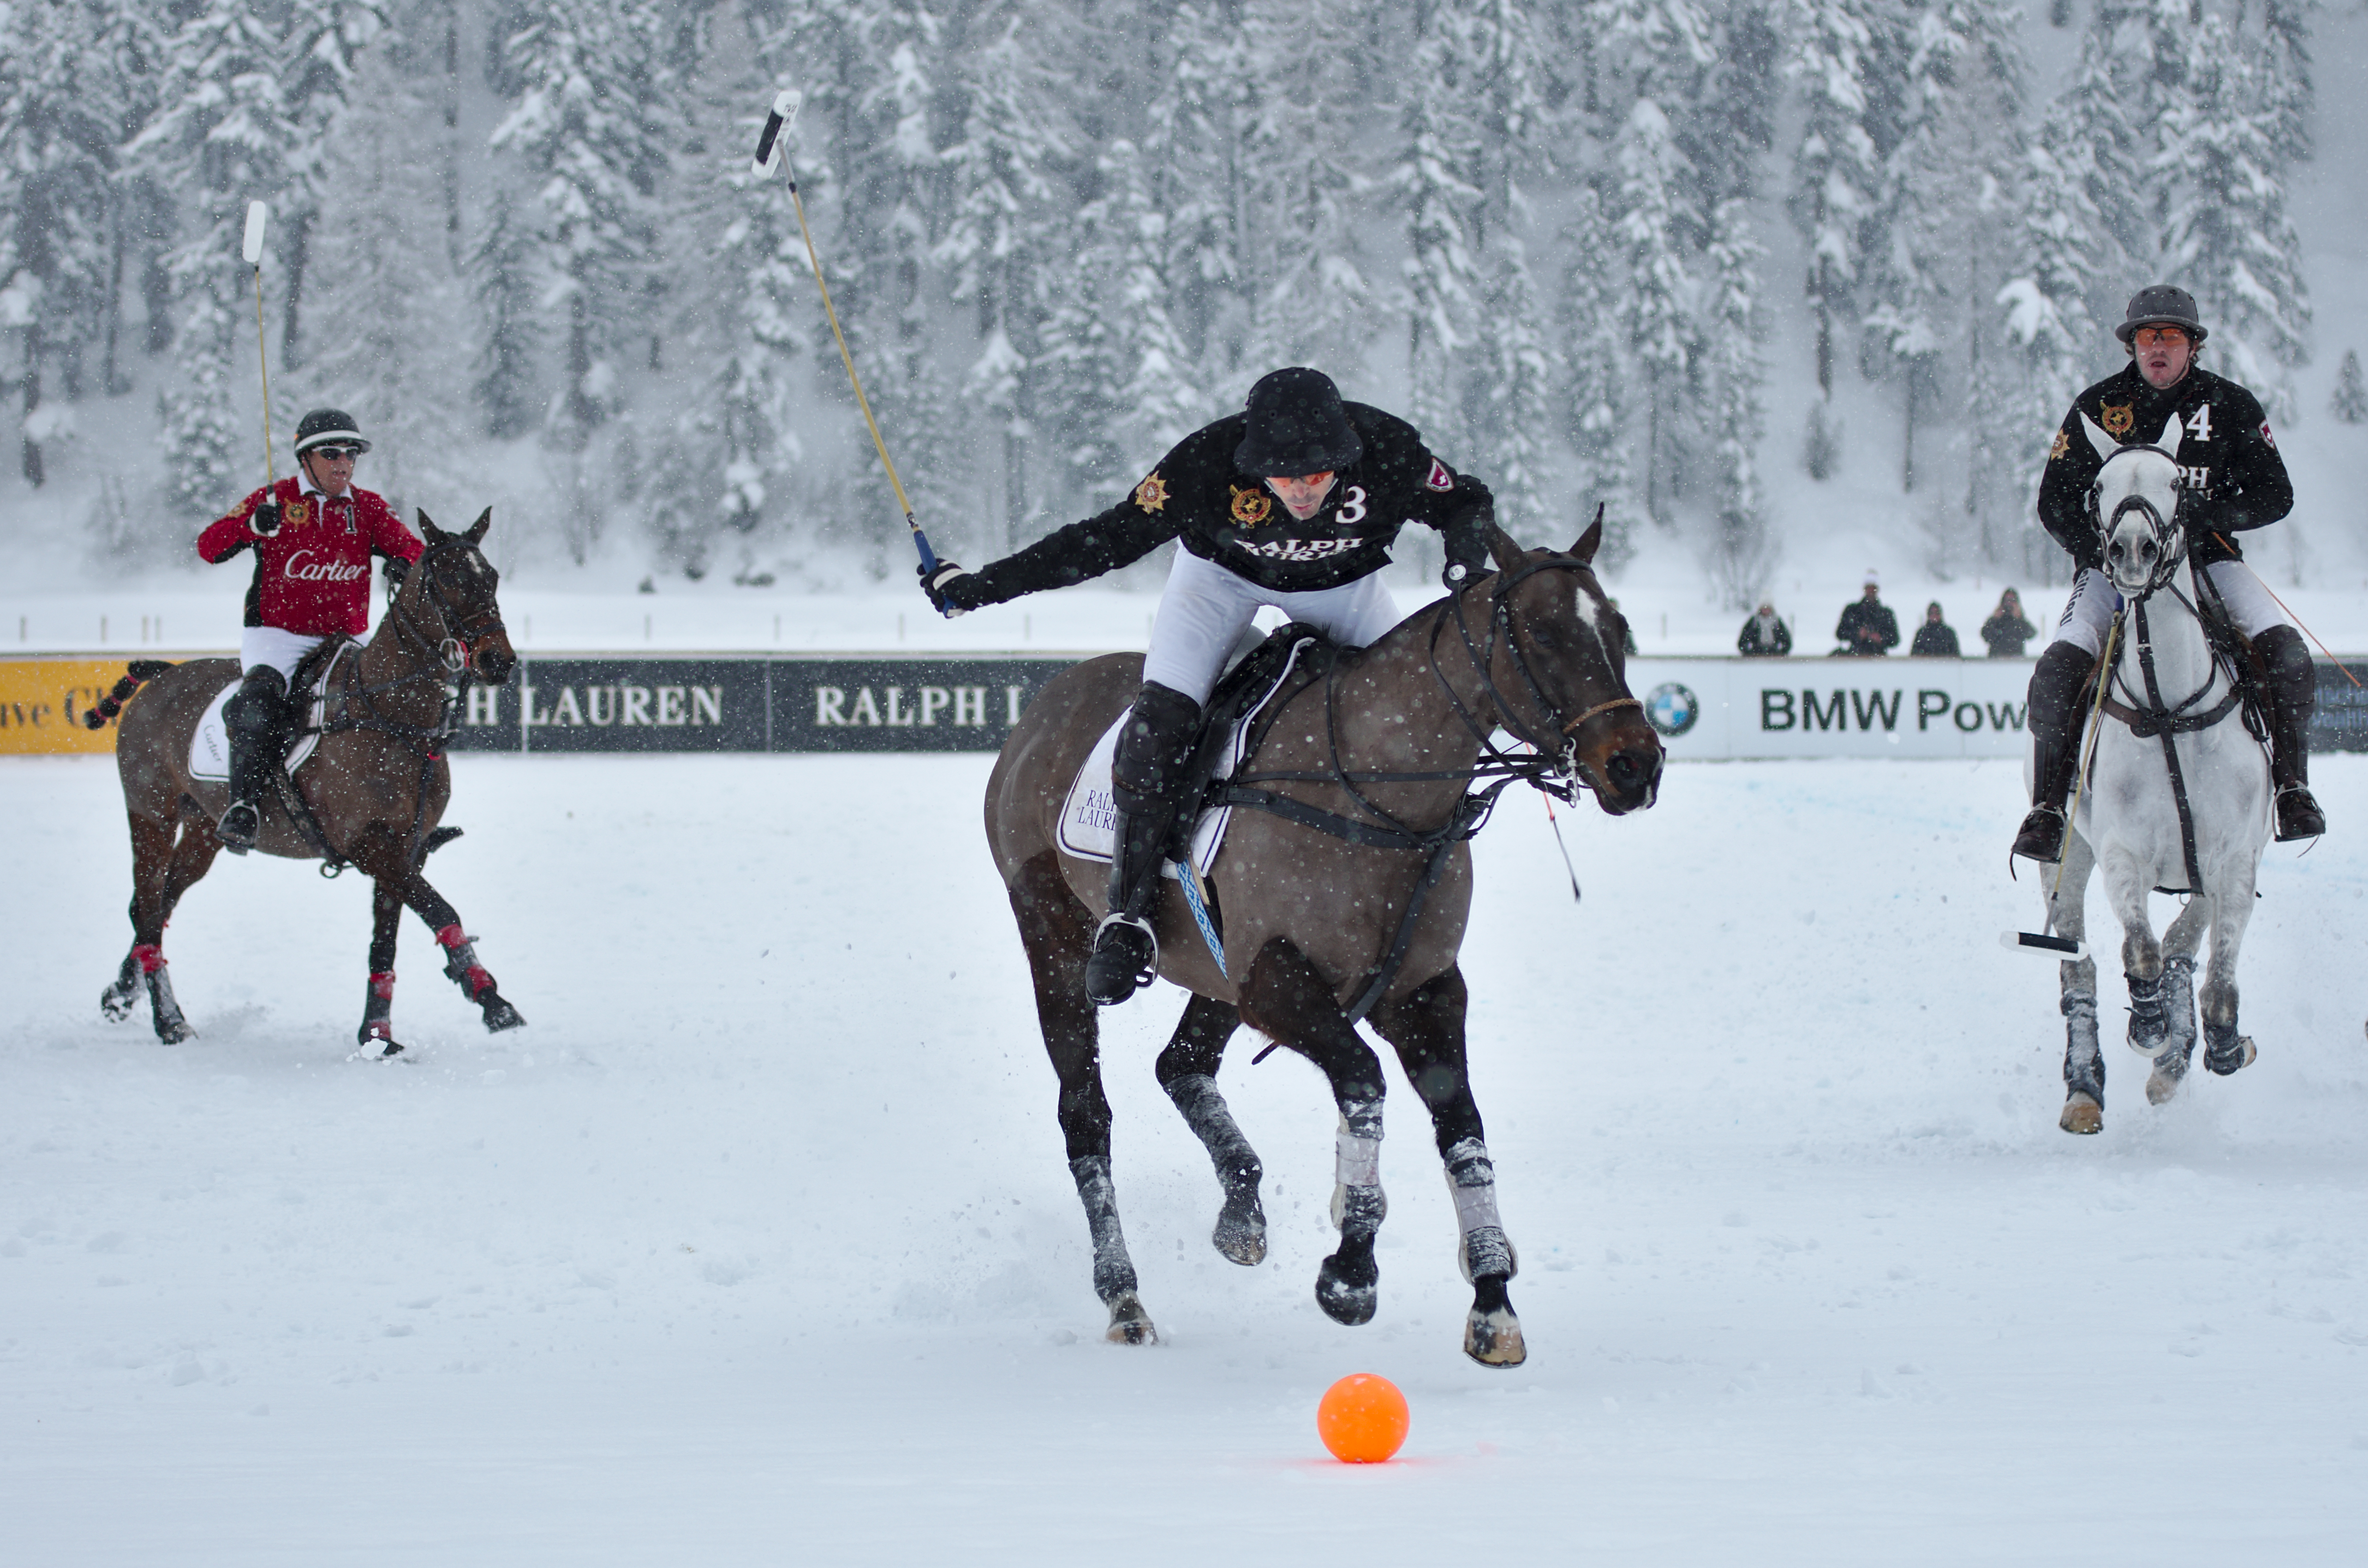 http://upload.wikimedia.org/wikipedia/commons/0/0d/30th_St._Moritz_Polo_World_Cup_on_Snow_-_20140202_-_Cartier_vs_Ralph_Lauren_5.jpg